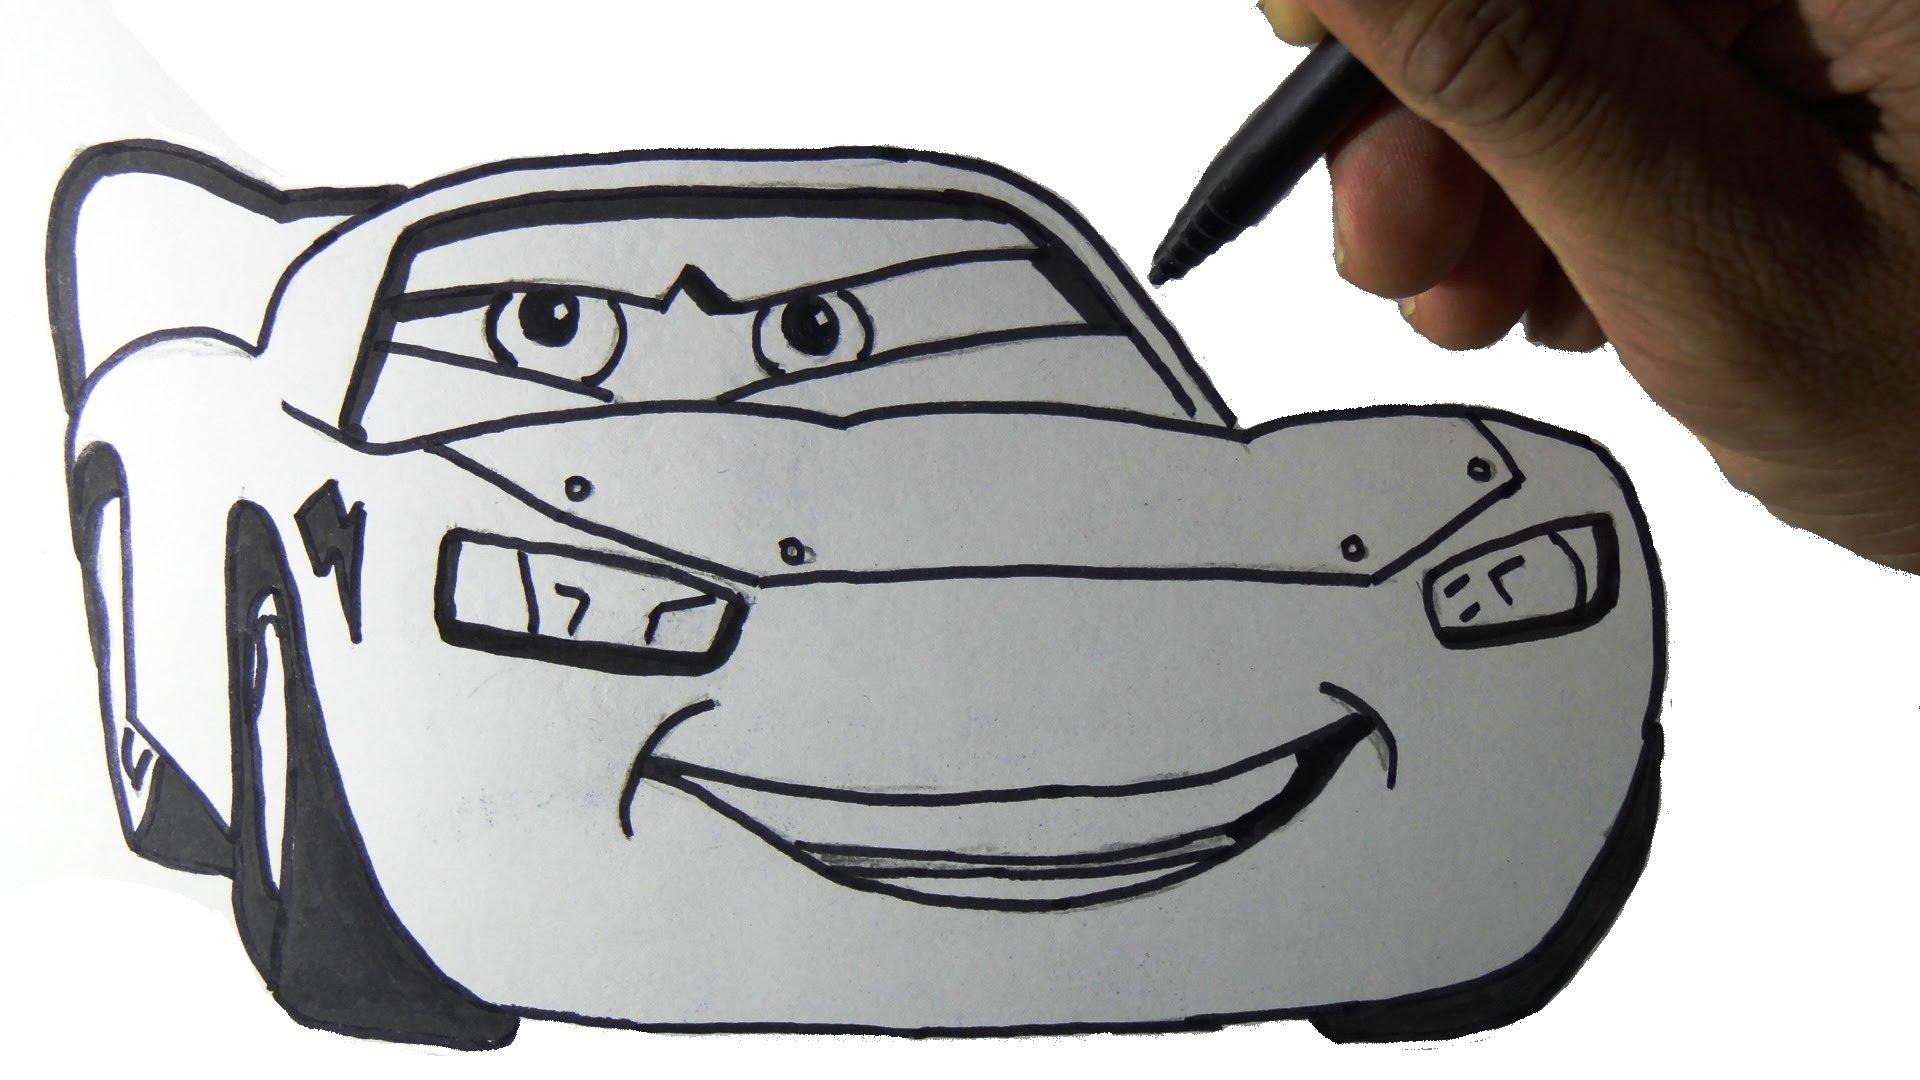 Line Drawing Cartoon Face : Cartoon drawing car at getdrawings.com free for personal use